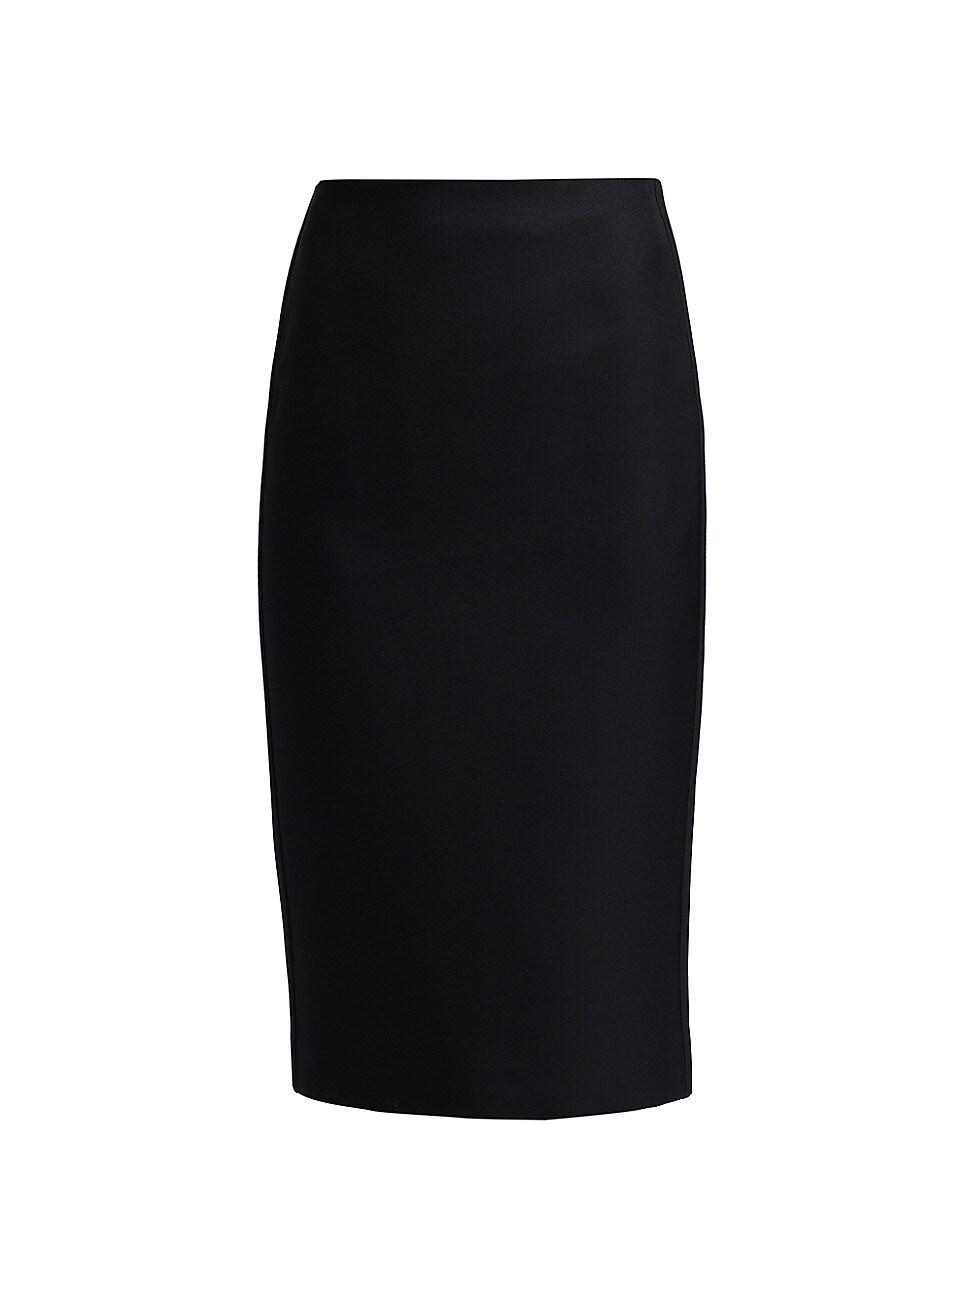 Fendi Clothing WOMEN'S WOOL & SILK PENCIL SKIRT